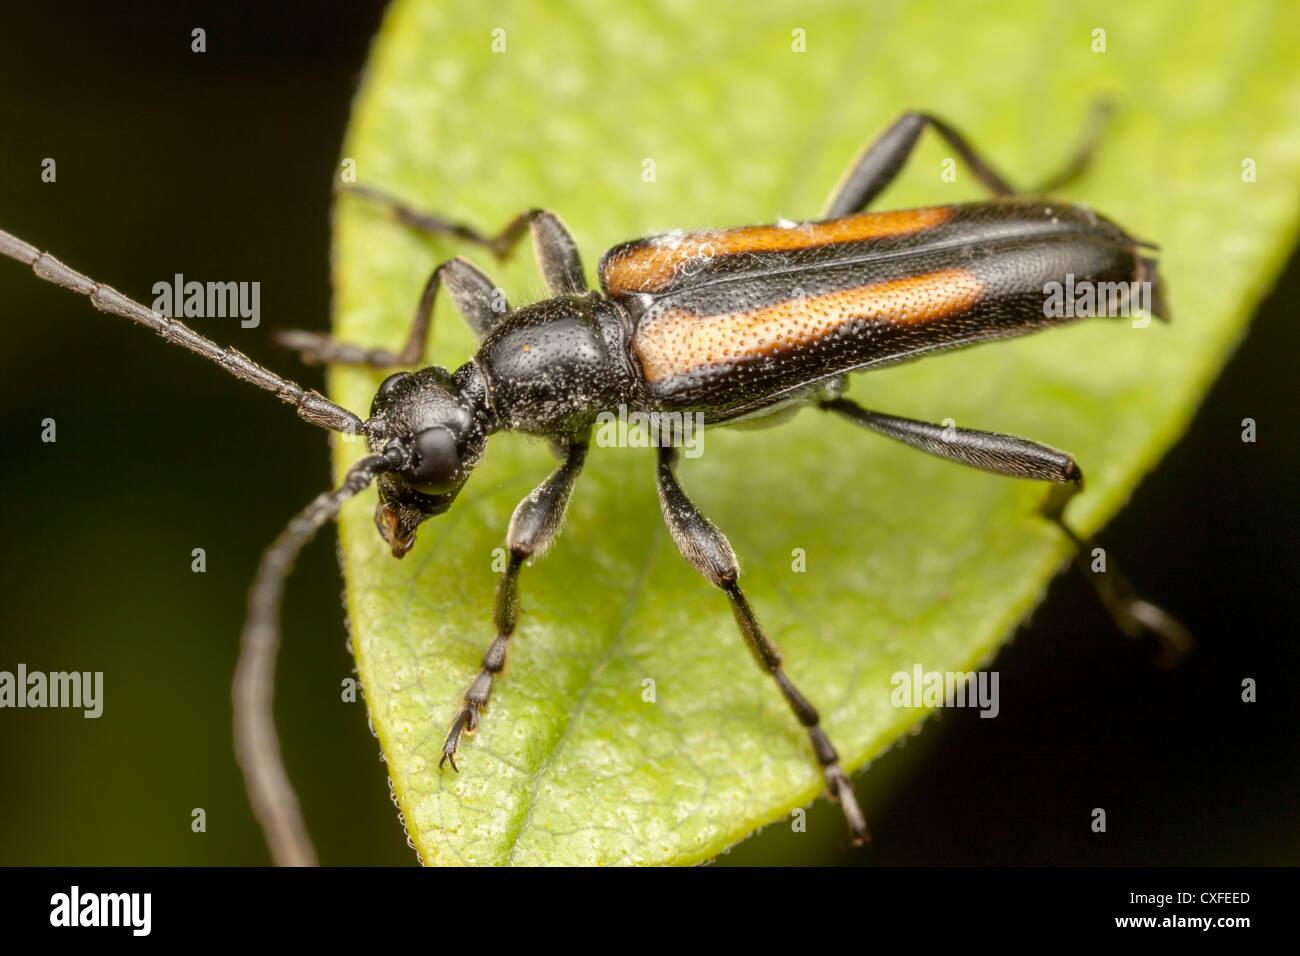 Flower longhorn beetle - PEST CONTROL CANADA